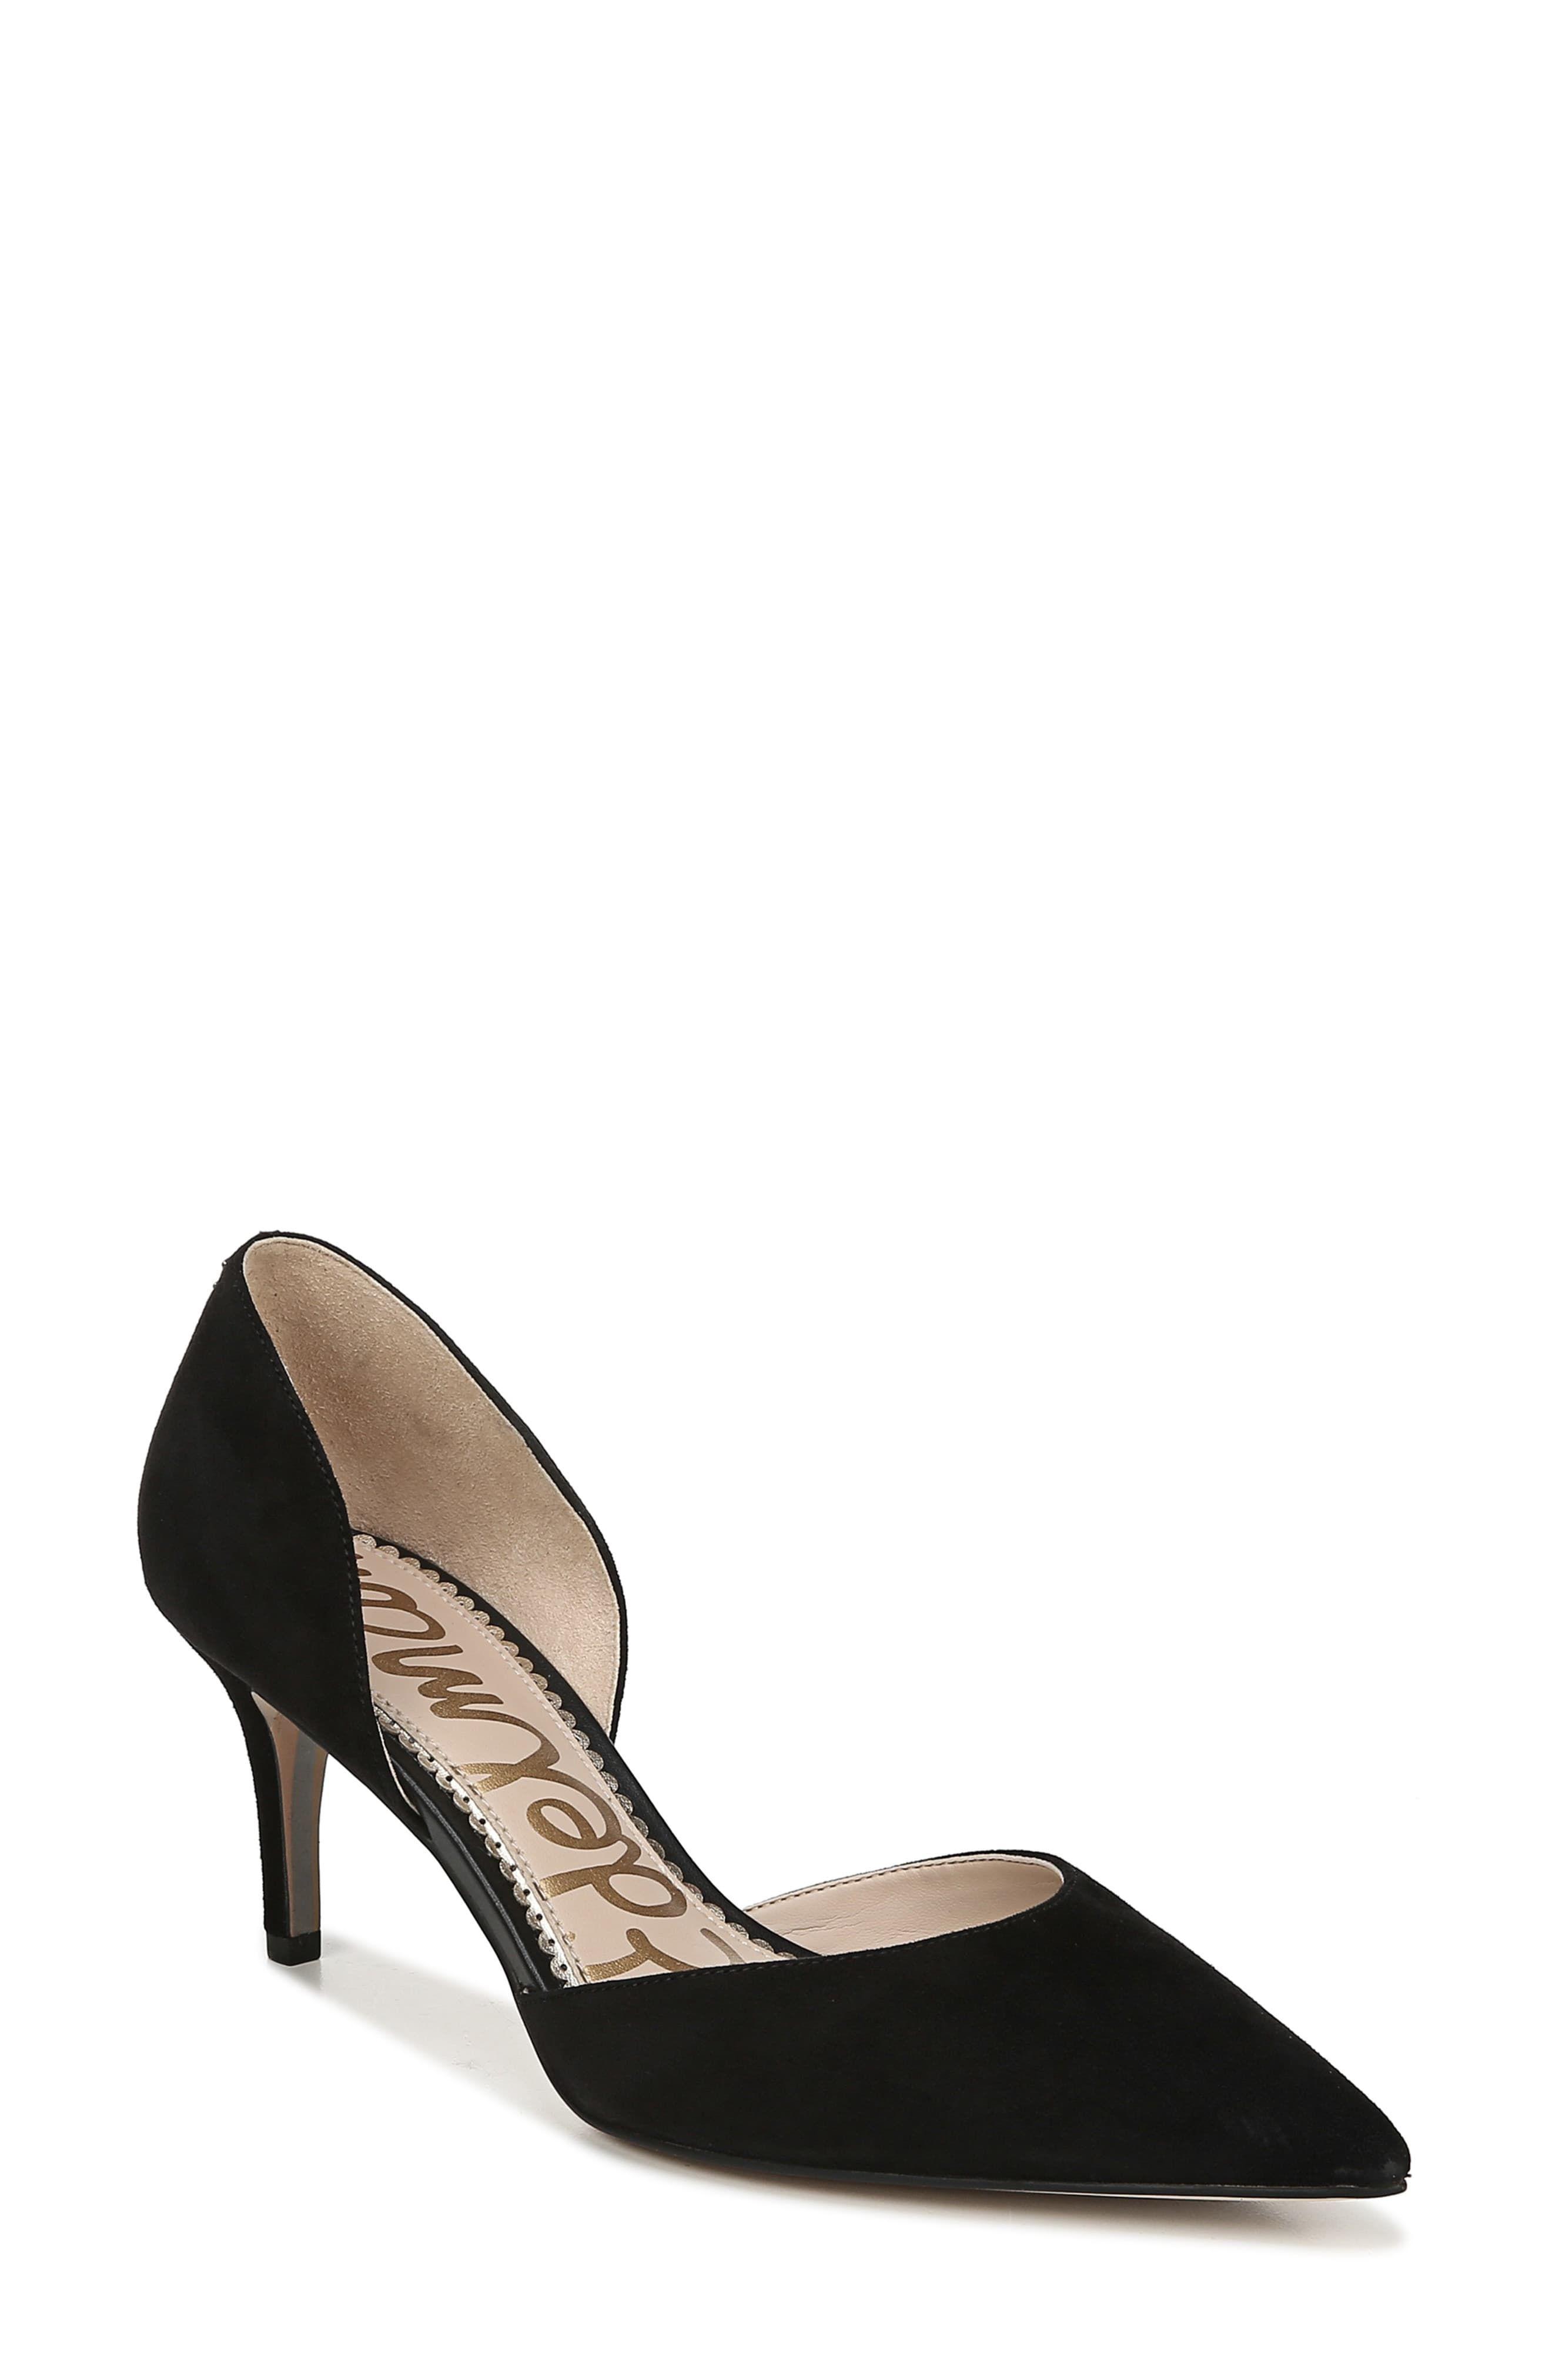 Sam Edelman Jaina Pointed Toe Pump Women Nordstrom Pumps Women S Pumps Women Shoes